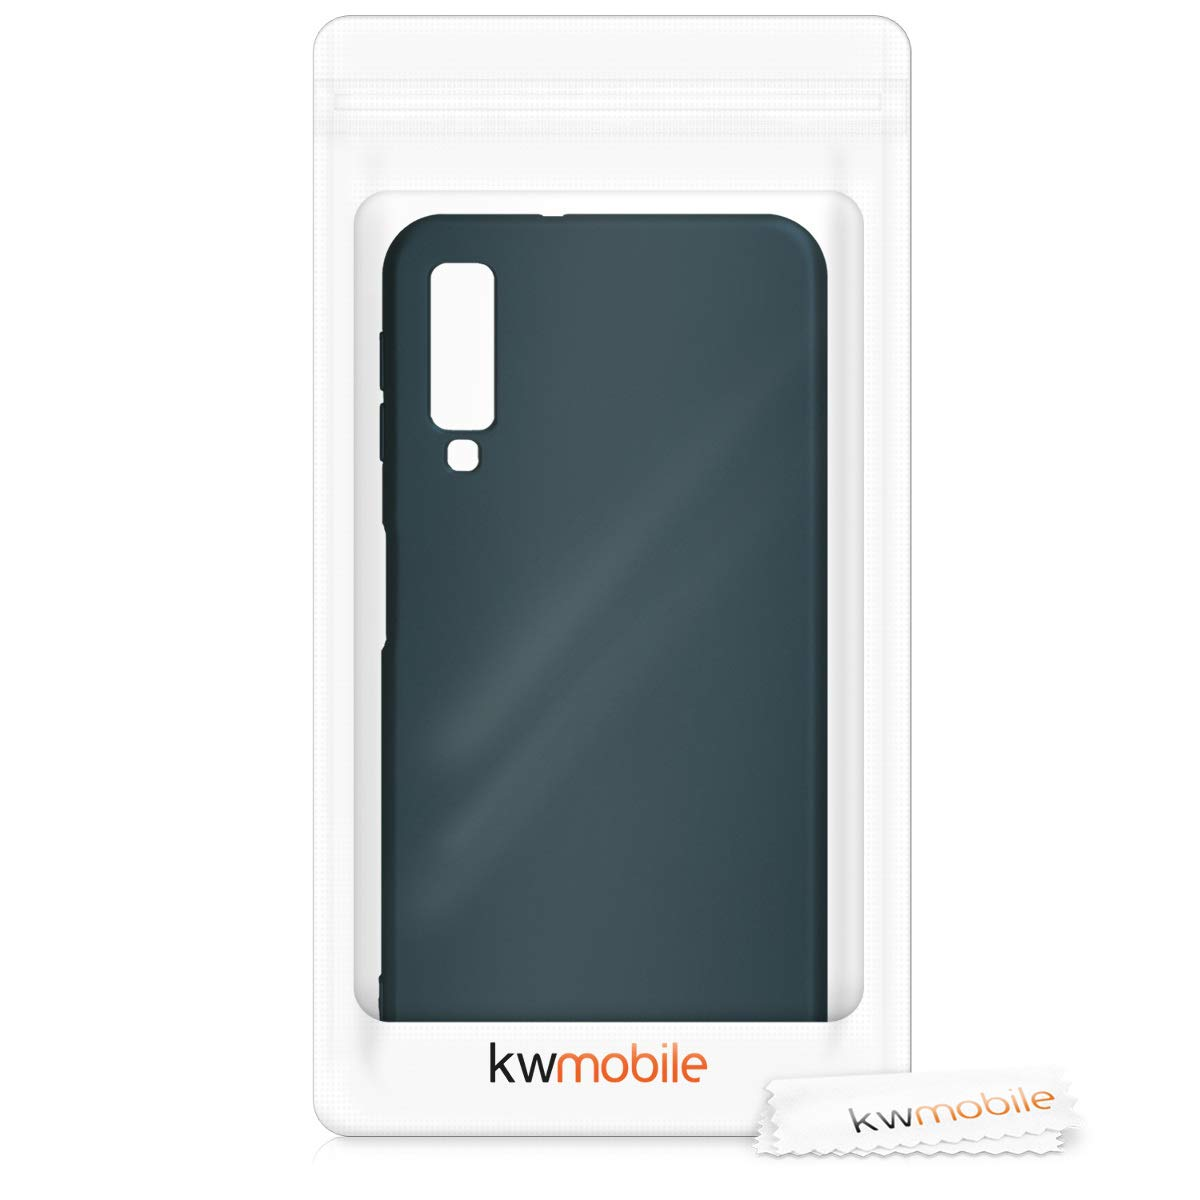 2018 Blanco//Transparente TPU para m/óvil y dise/ño Dibujo de coraz/ón en kwmobile Funda para Samsung Galaxy A7 - Carcasa de